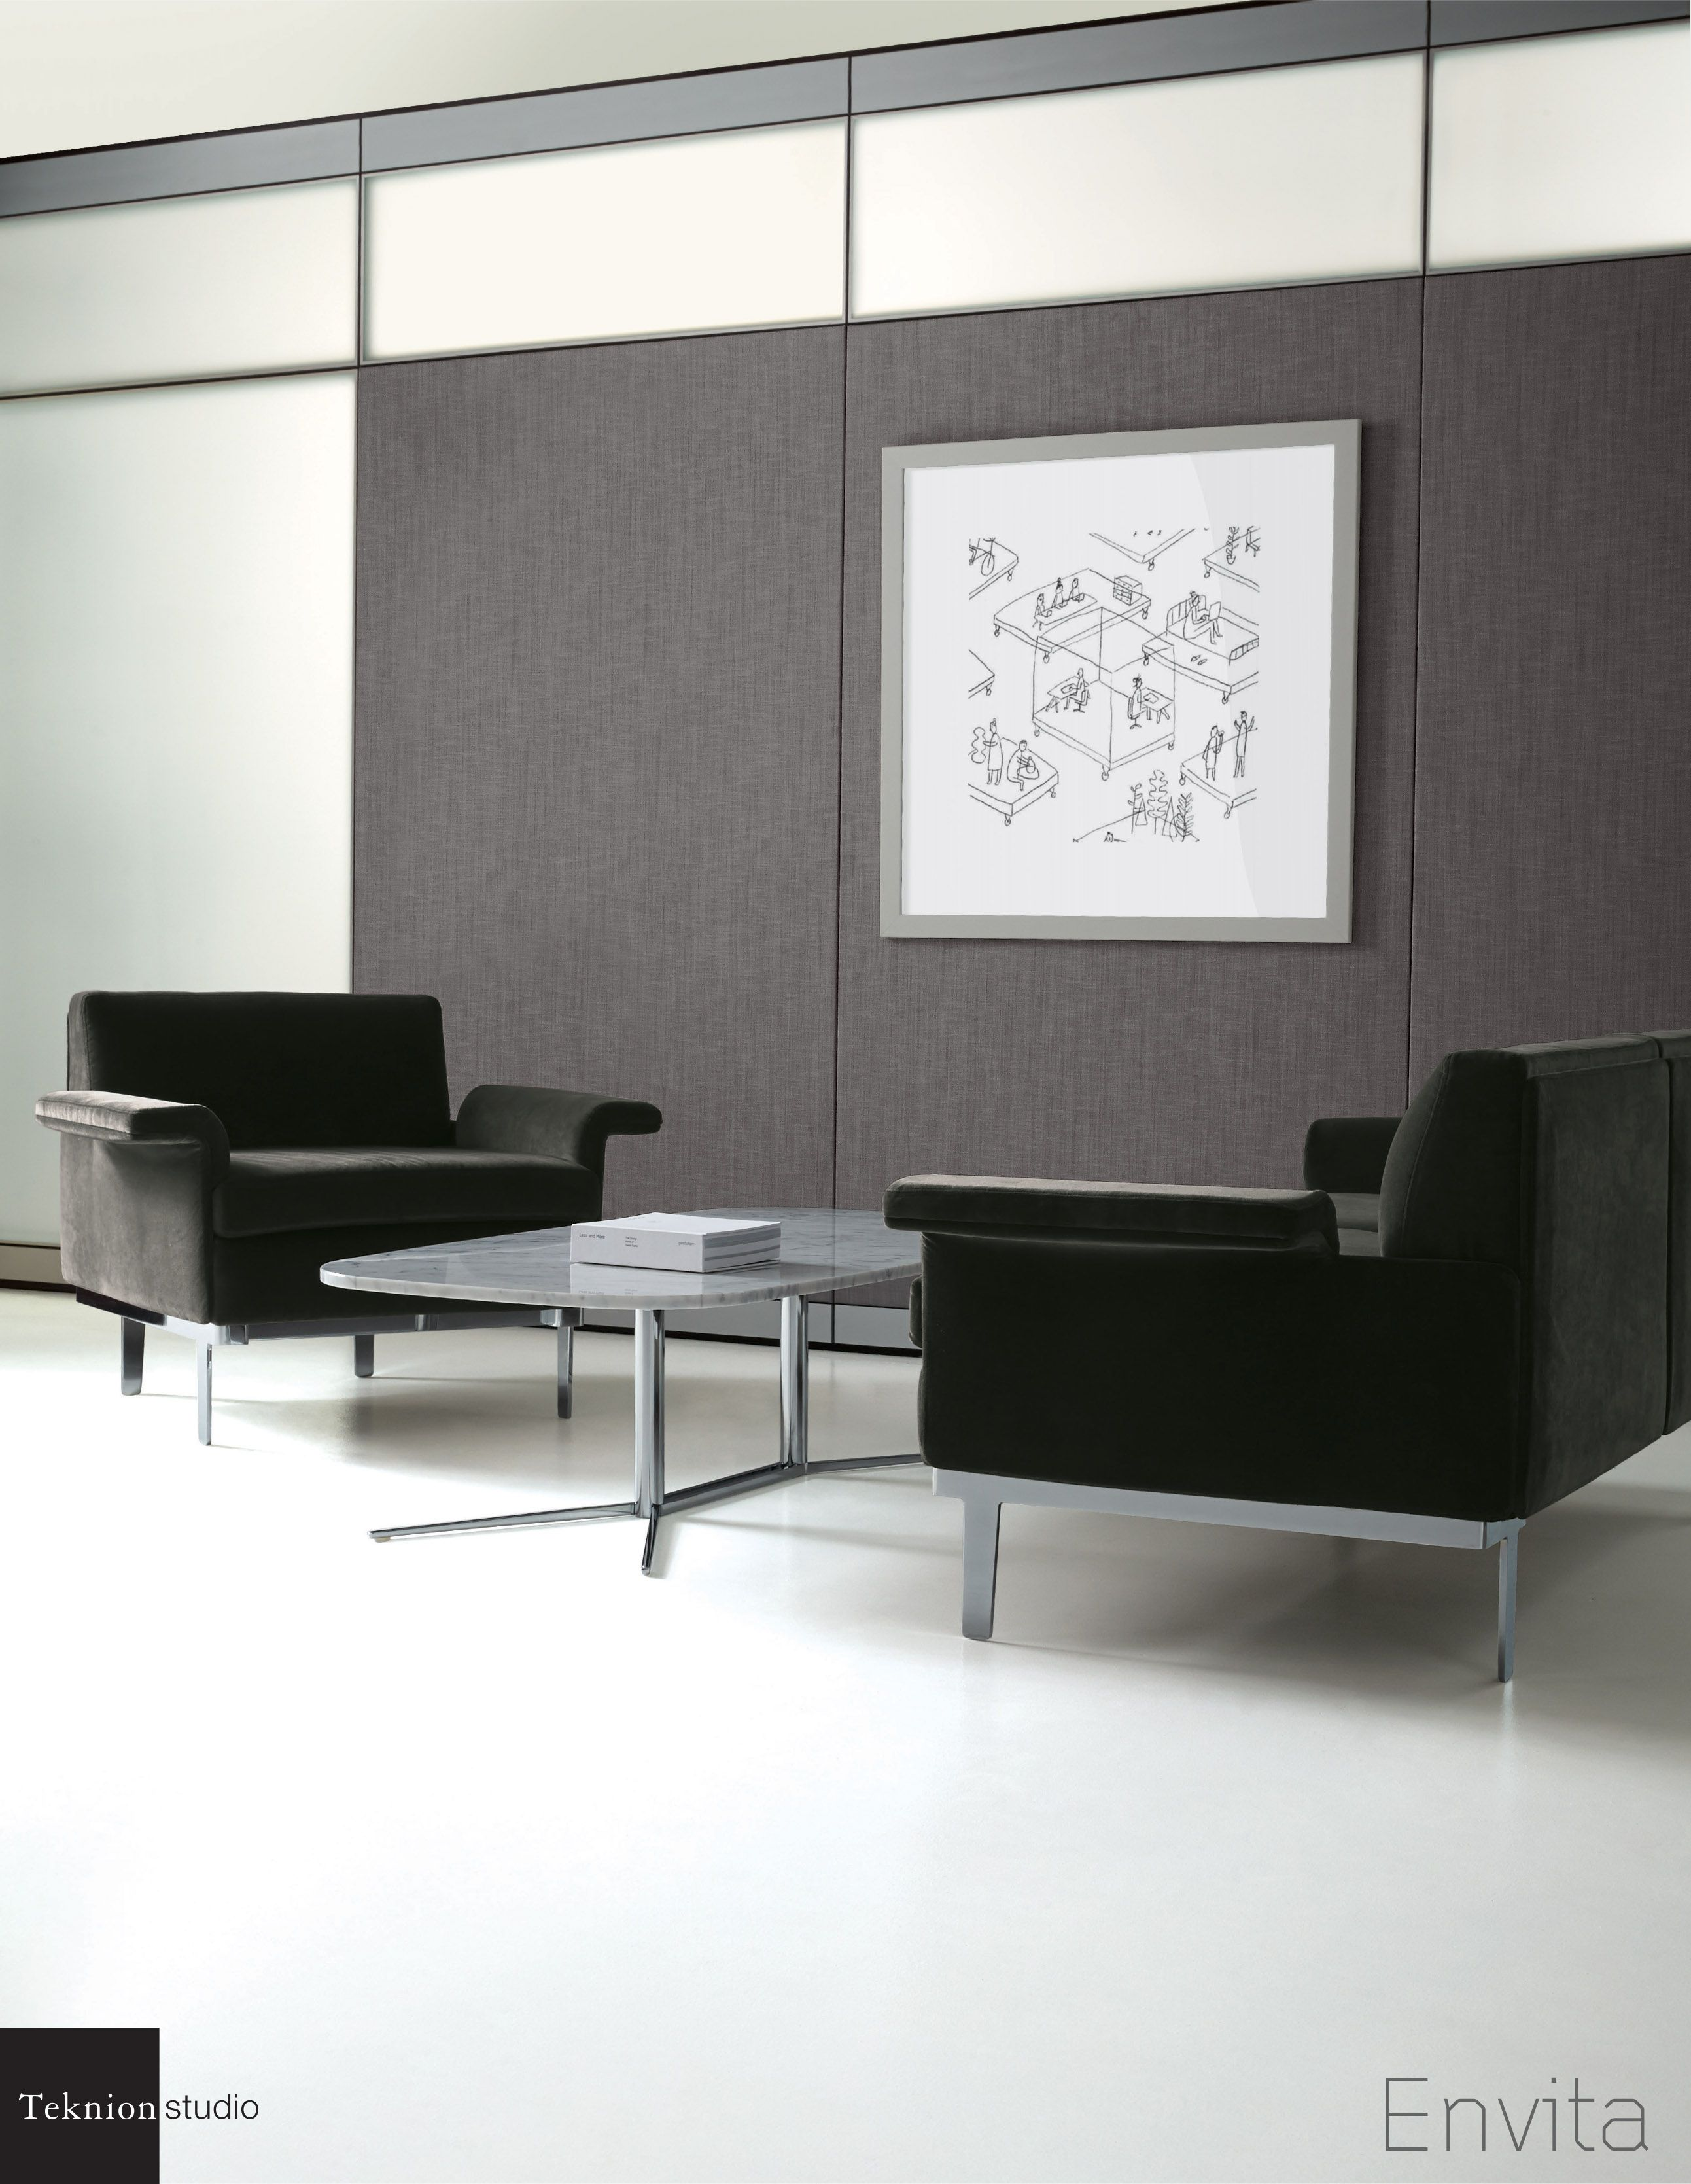 Pleasant Created By Mario Ruiz For Studio Tk The Envita Series Of Ibusinesslaw Wood Chair Design Ideas Ibusinesslaworg